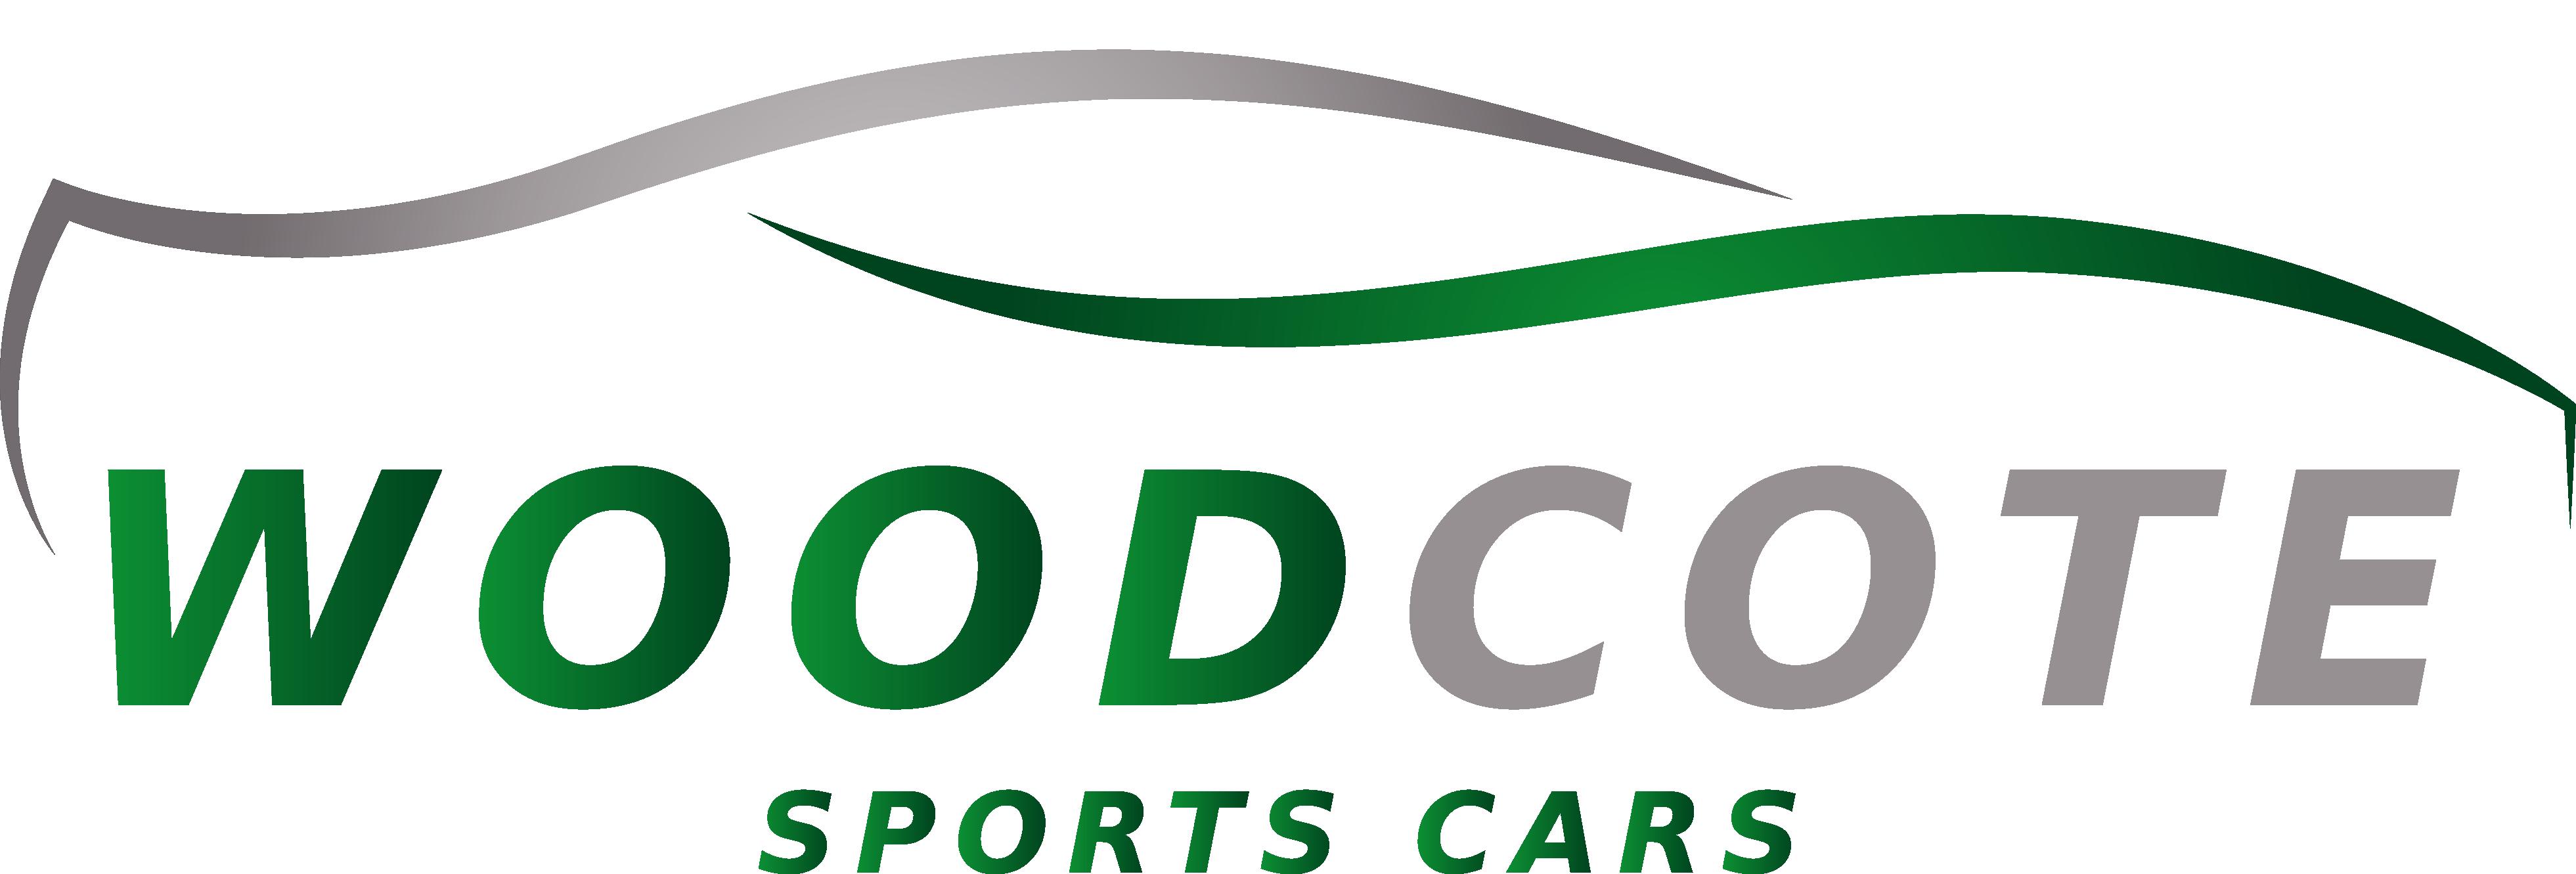 Woodcote Sports Cars